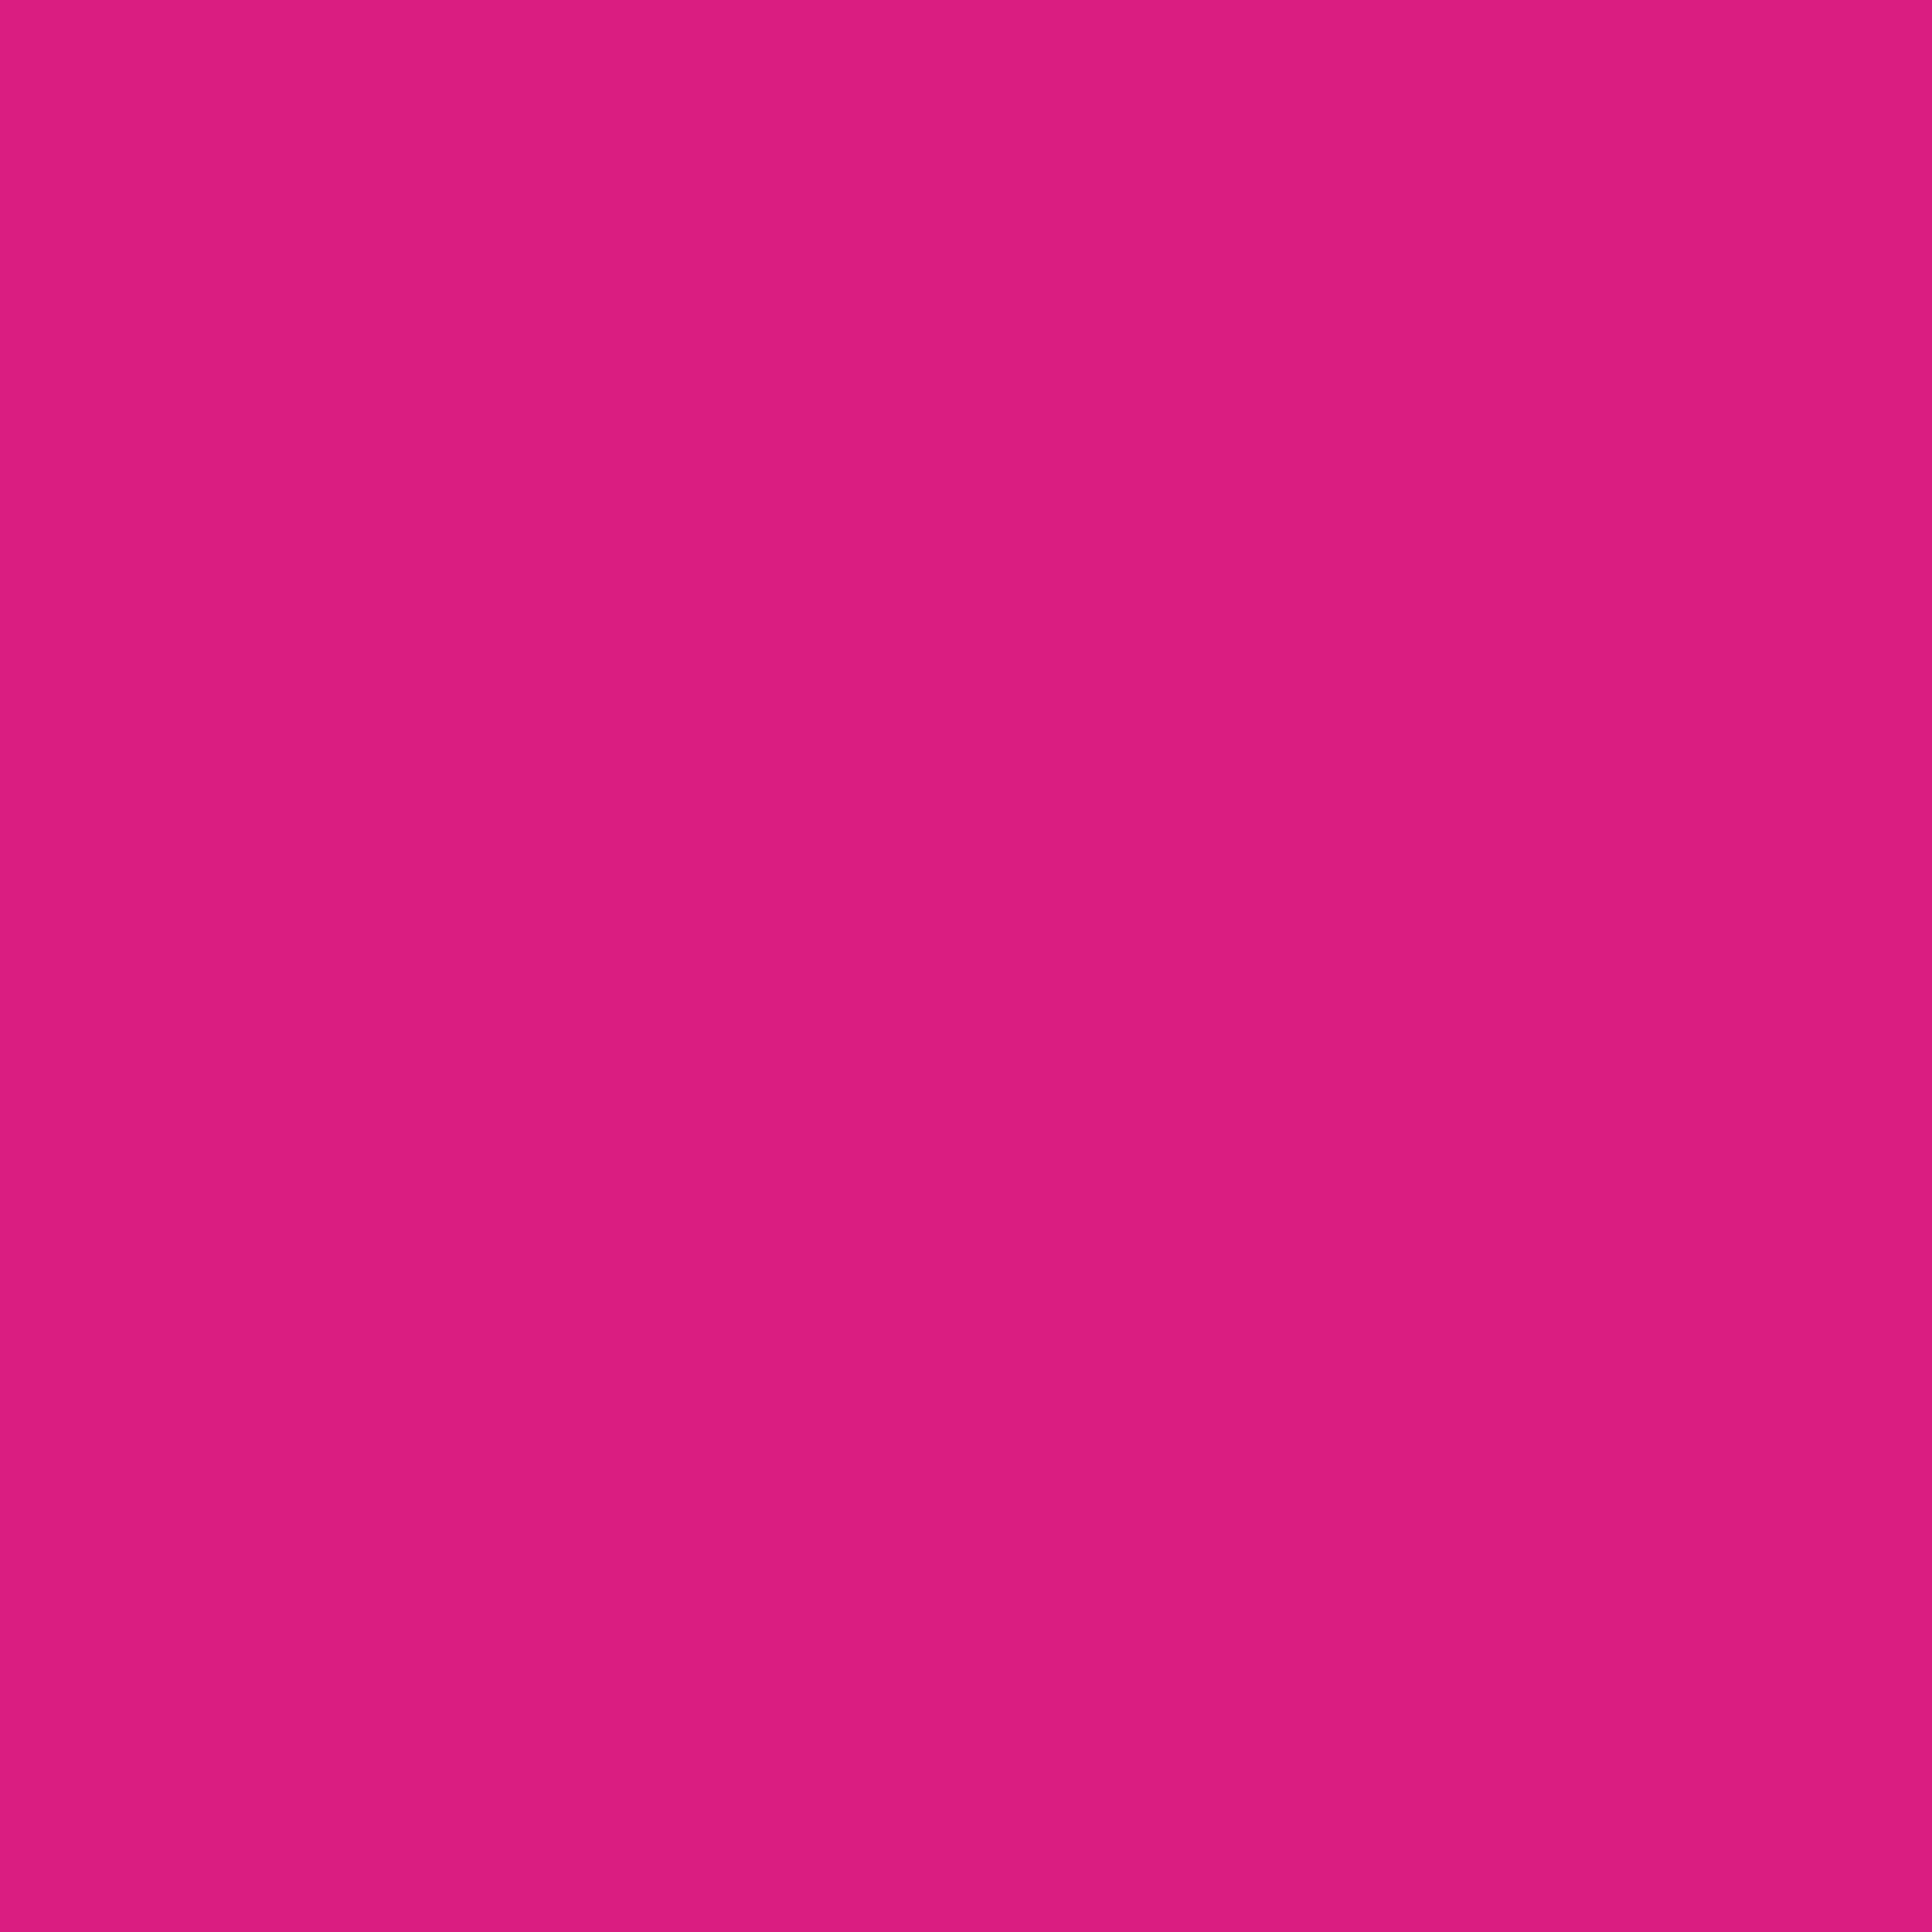 2732x2732 Vivid Cerise Solid Color Background